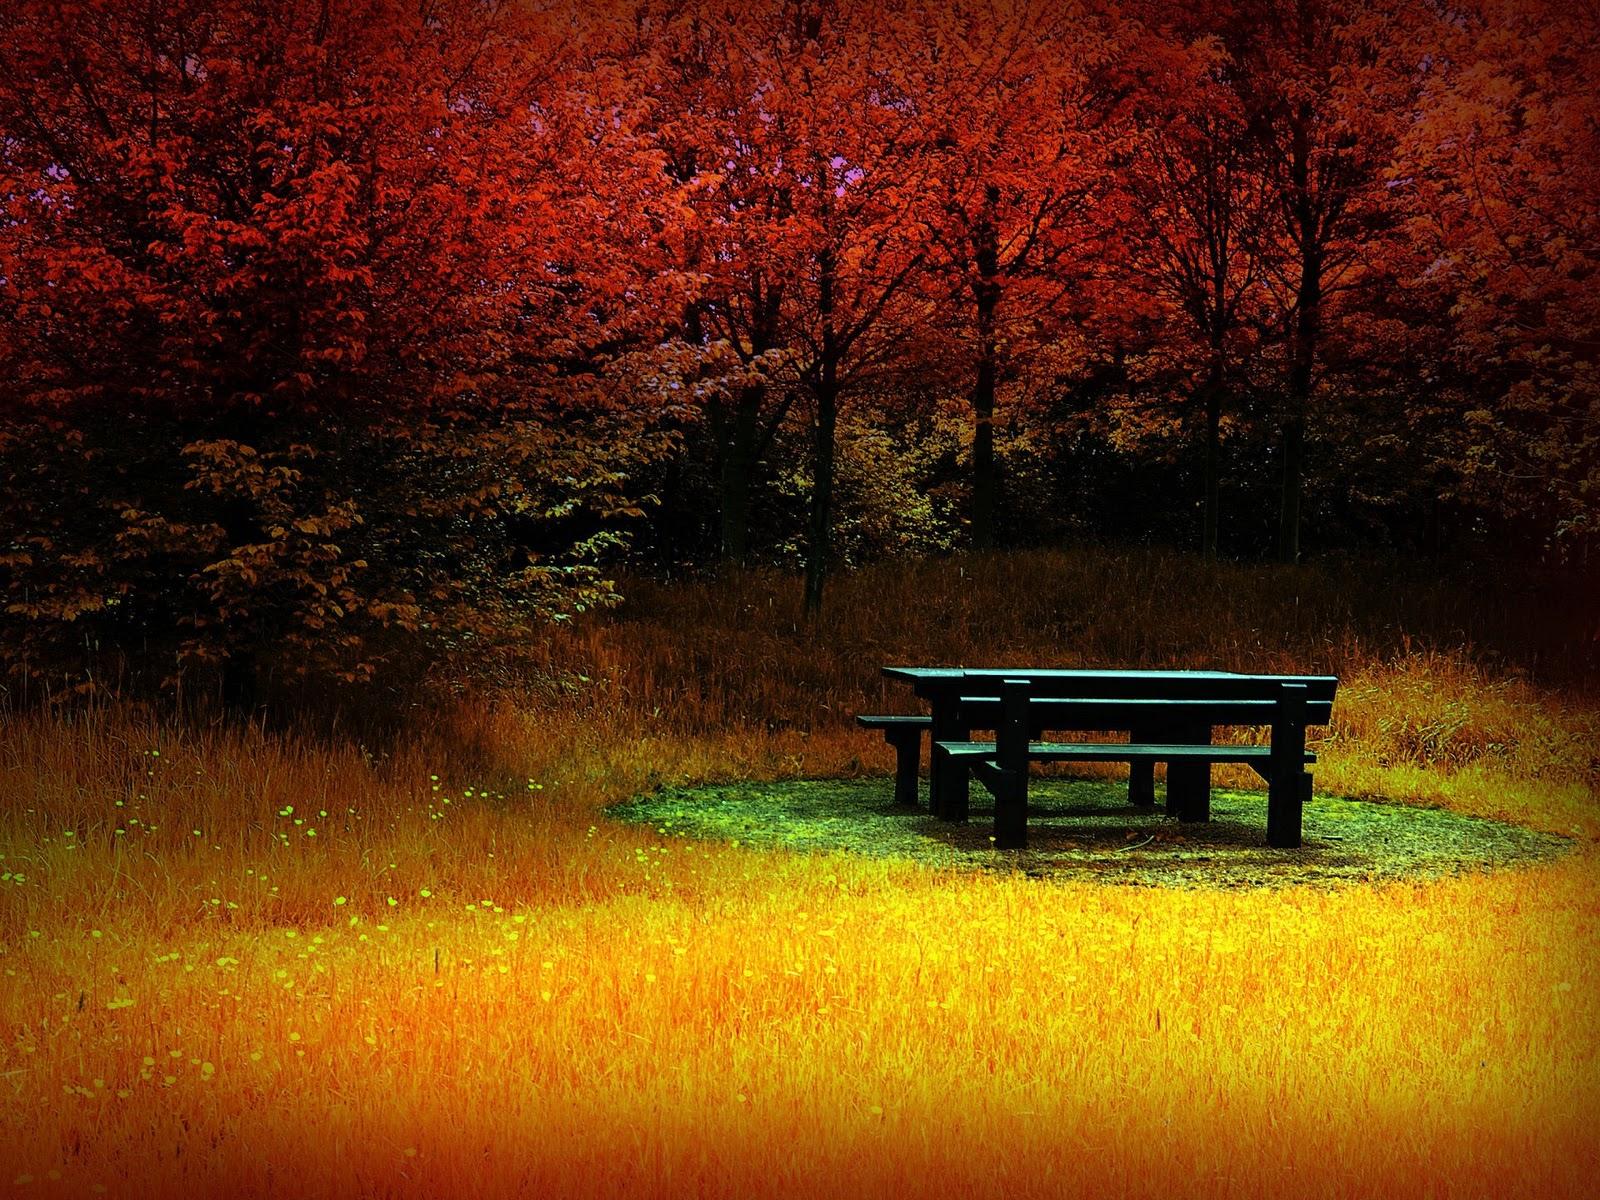 http://2.bp.blogspot.com/-69bP5zu4bmE/UJZlWv4TZSI/AAAAAAAAHpQ/vYxn6ifbvjw/s1600/Autumn+Beautiful+Scene.jpg